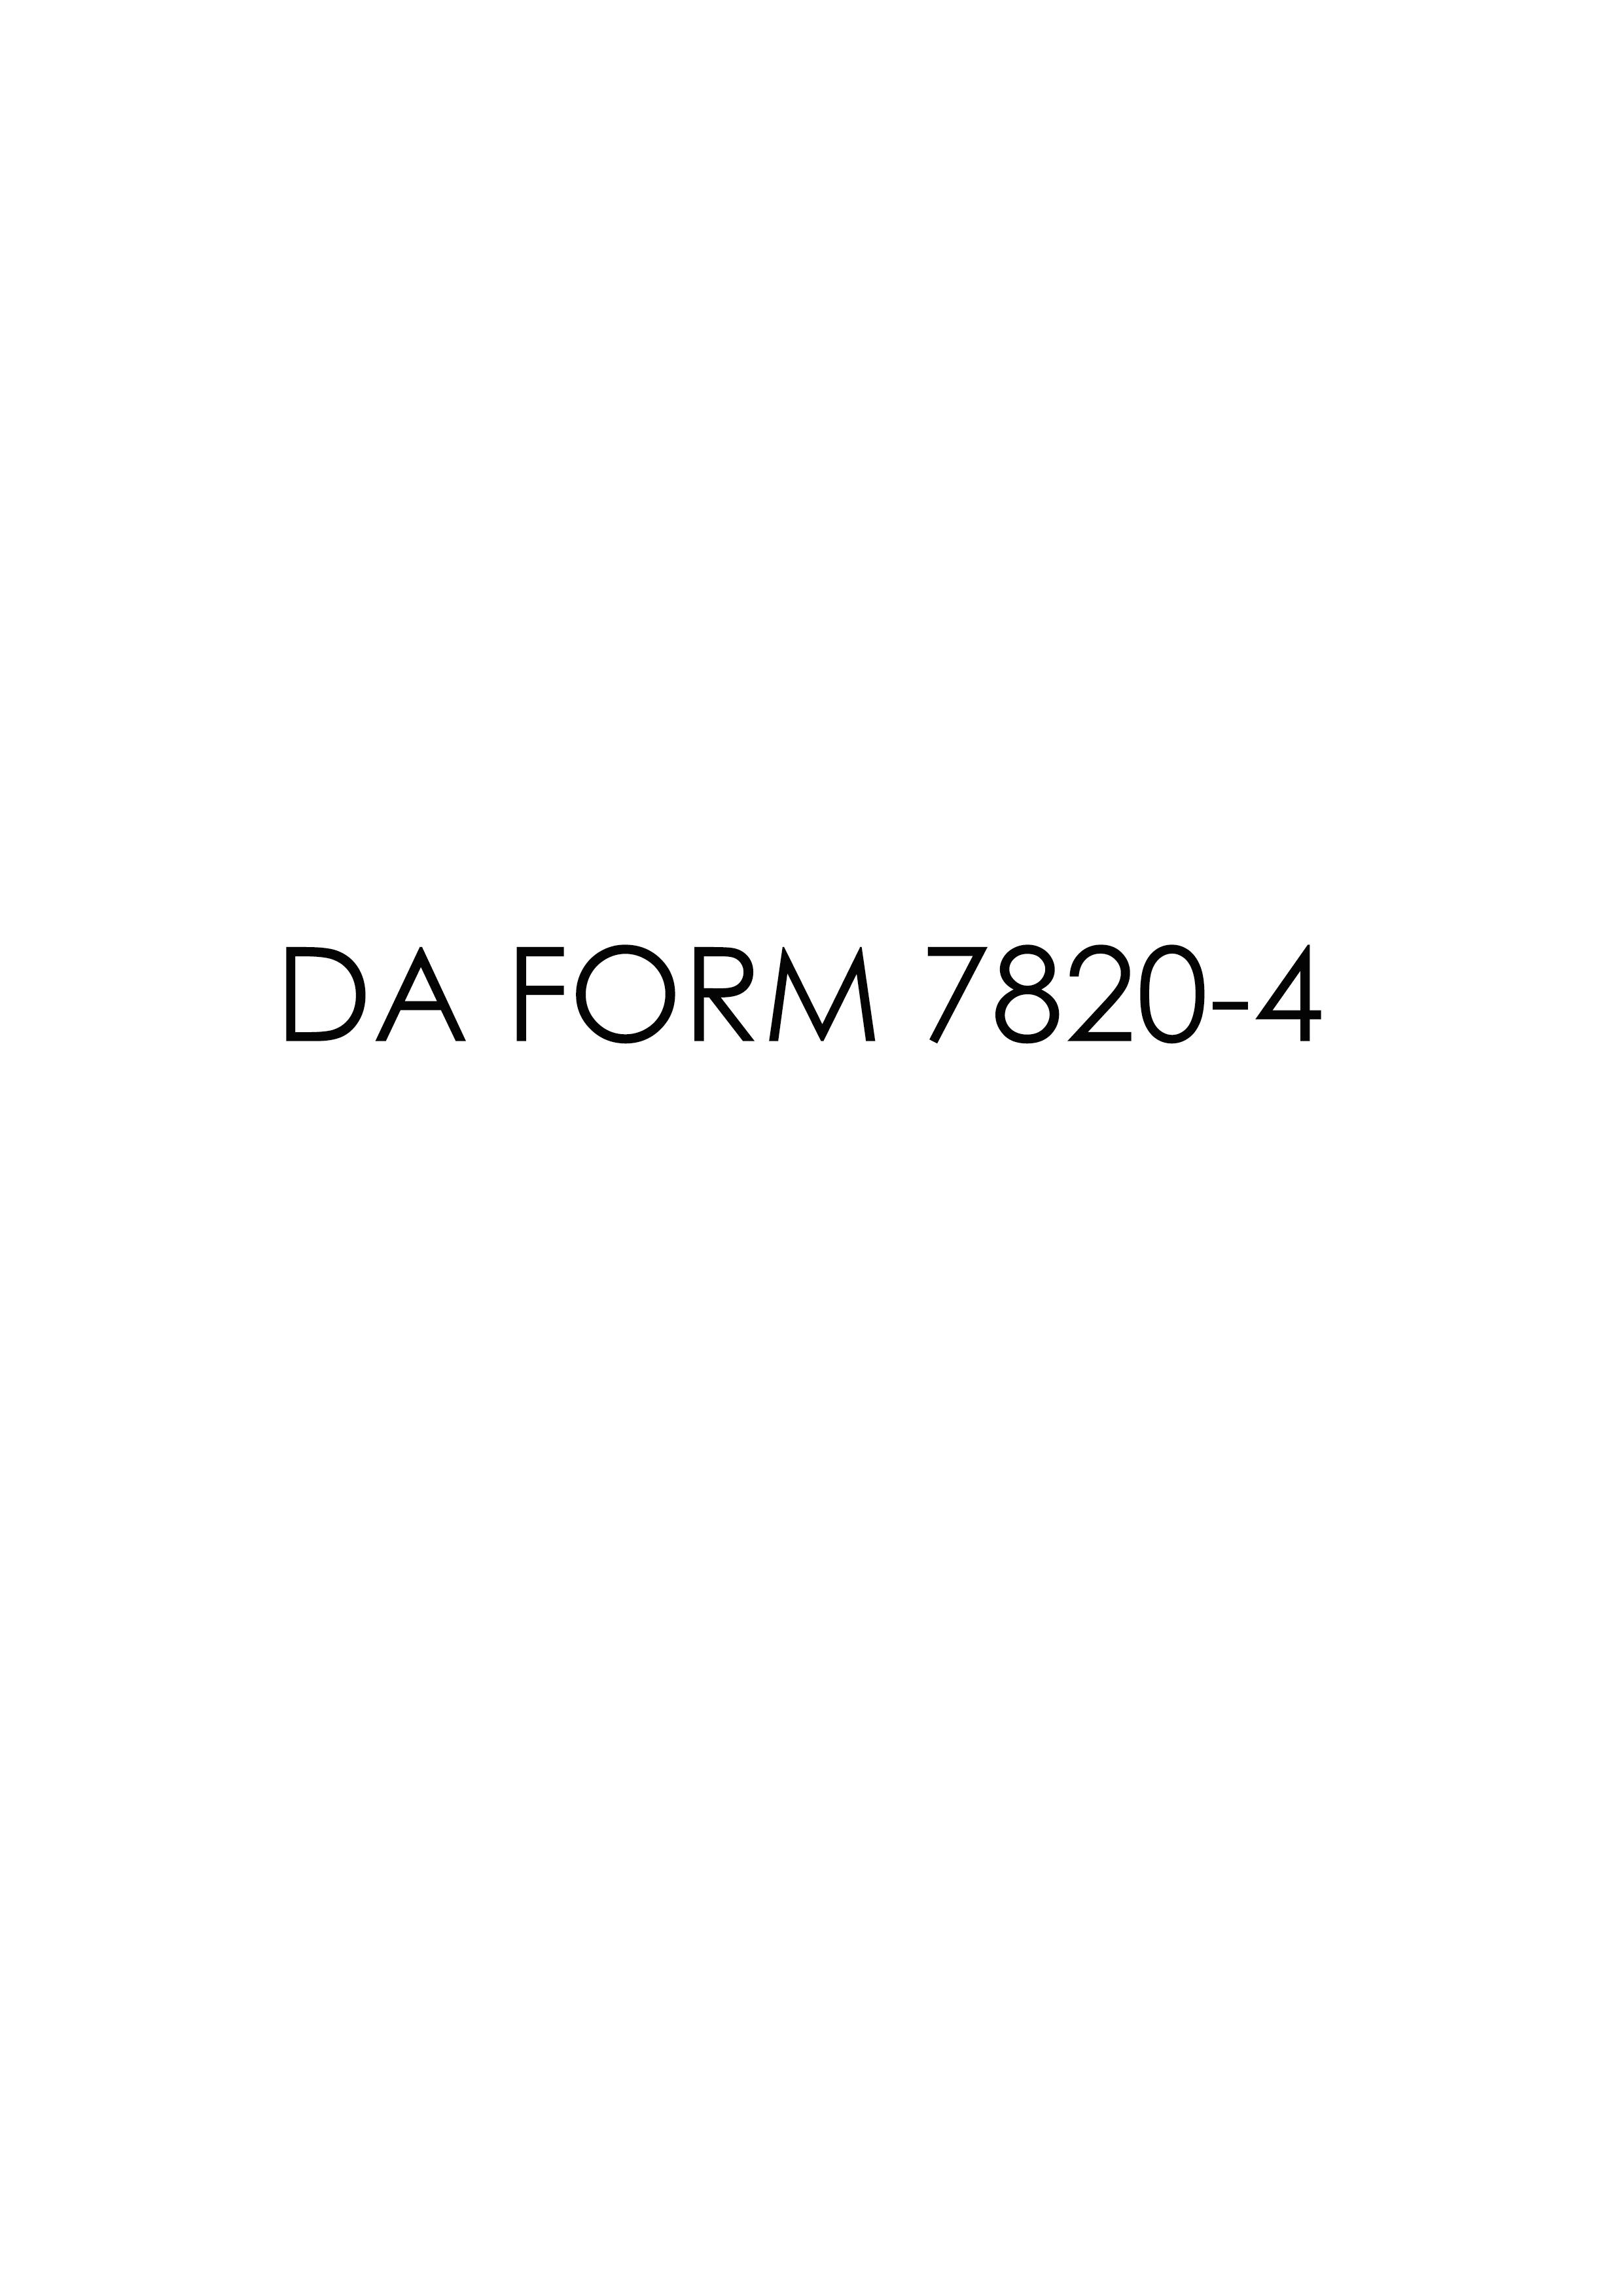 Download da Form 7820-4 Free